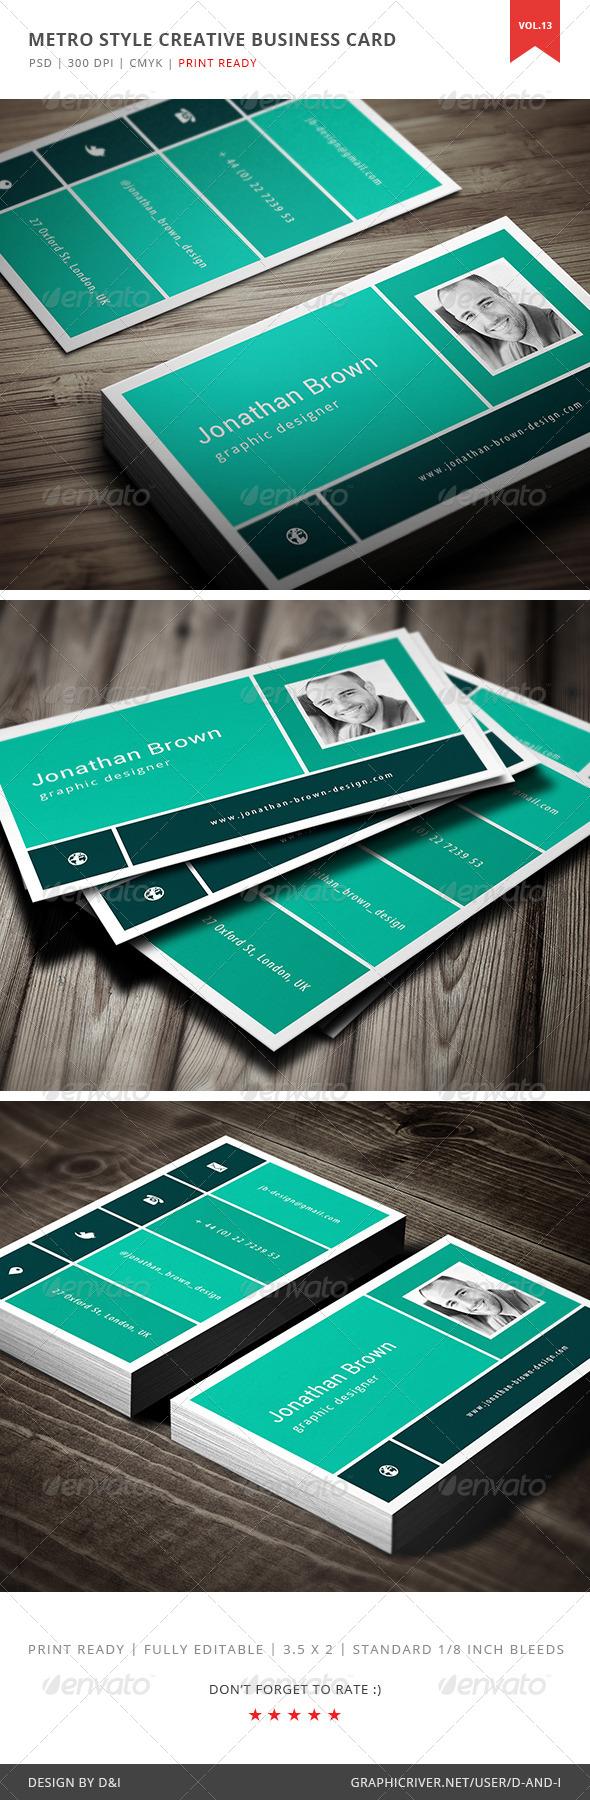 Metro Style Creative Business Card